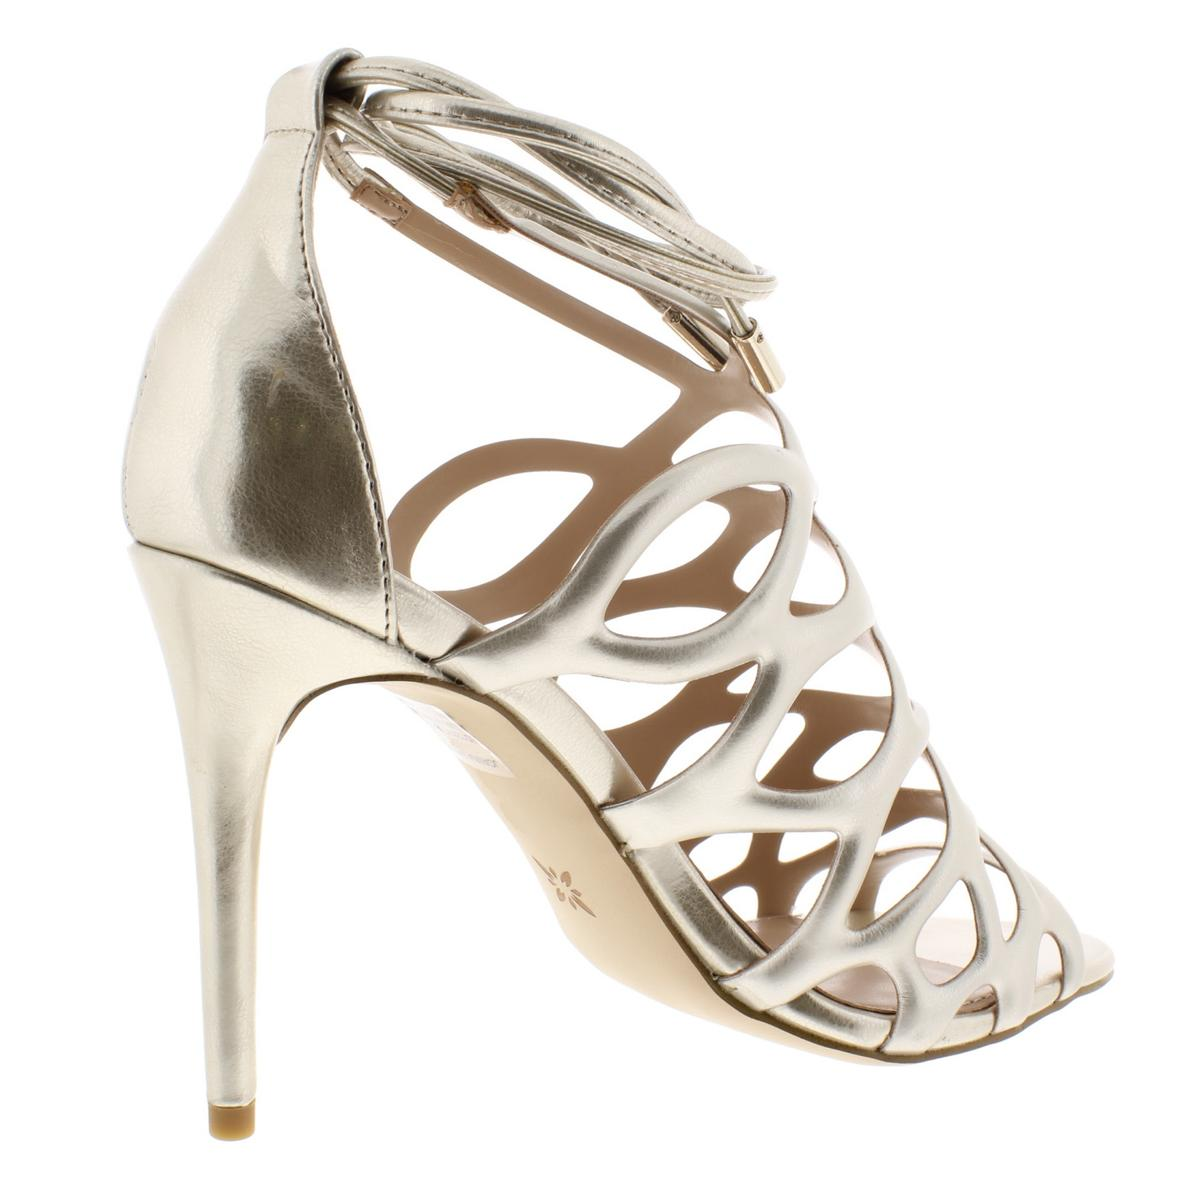 BCBGeneration-Womens-Joanna-Metallic-Caged-Dress-Sandals-Shoes-BHFO-8380 thumbnail 8